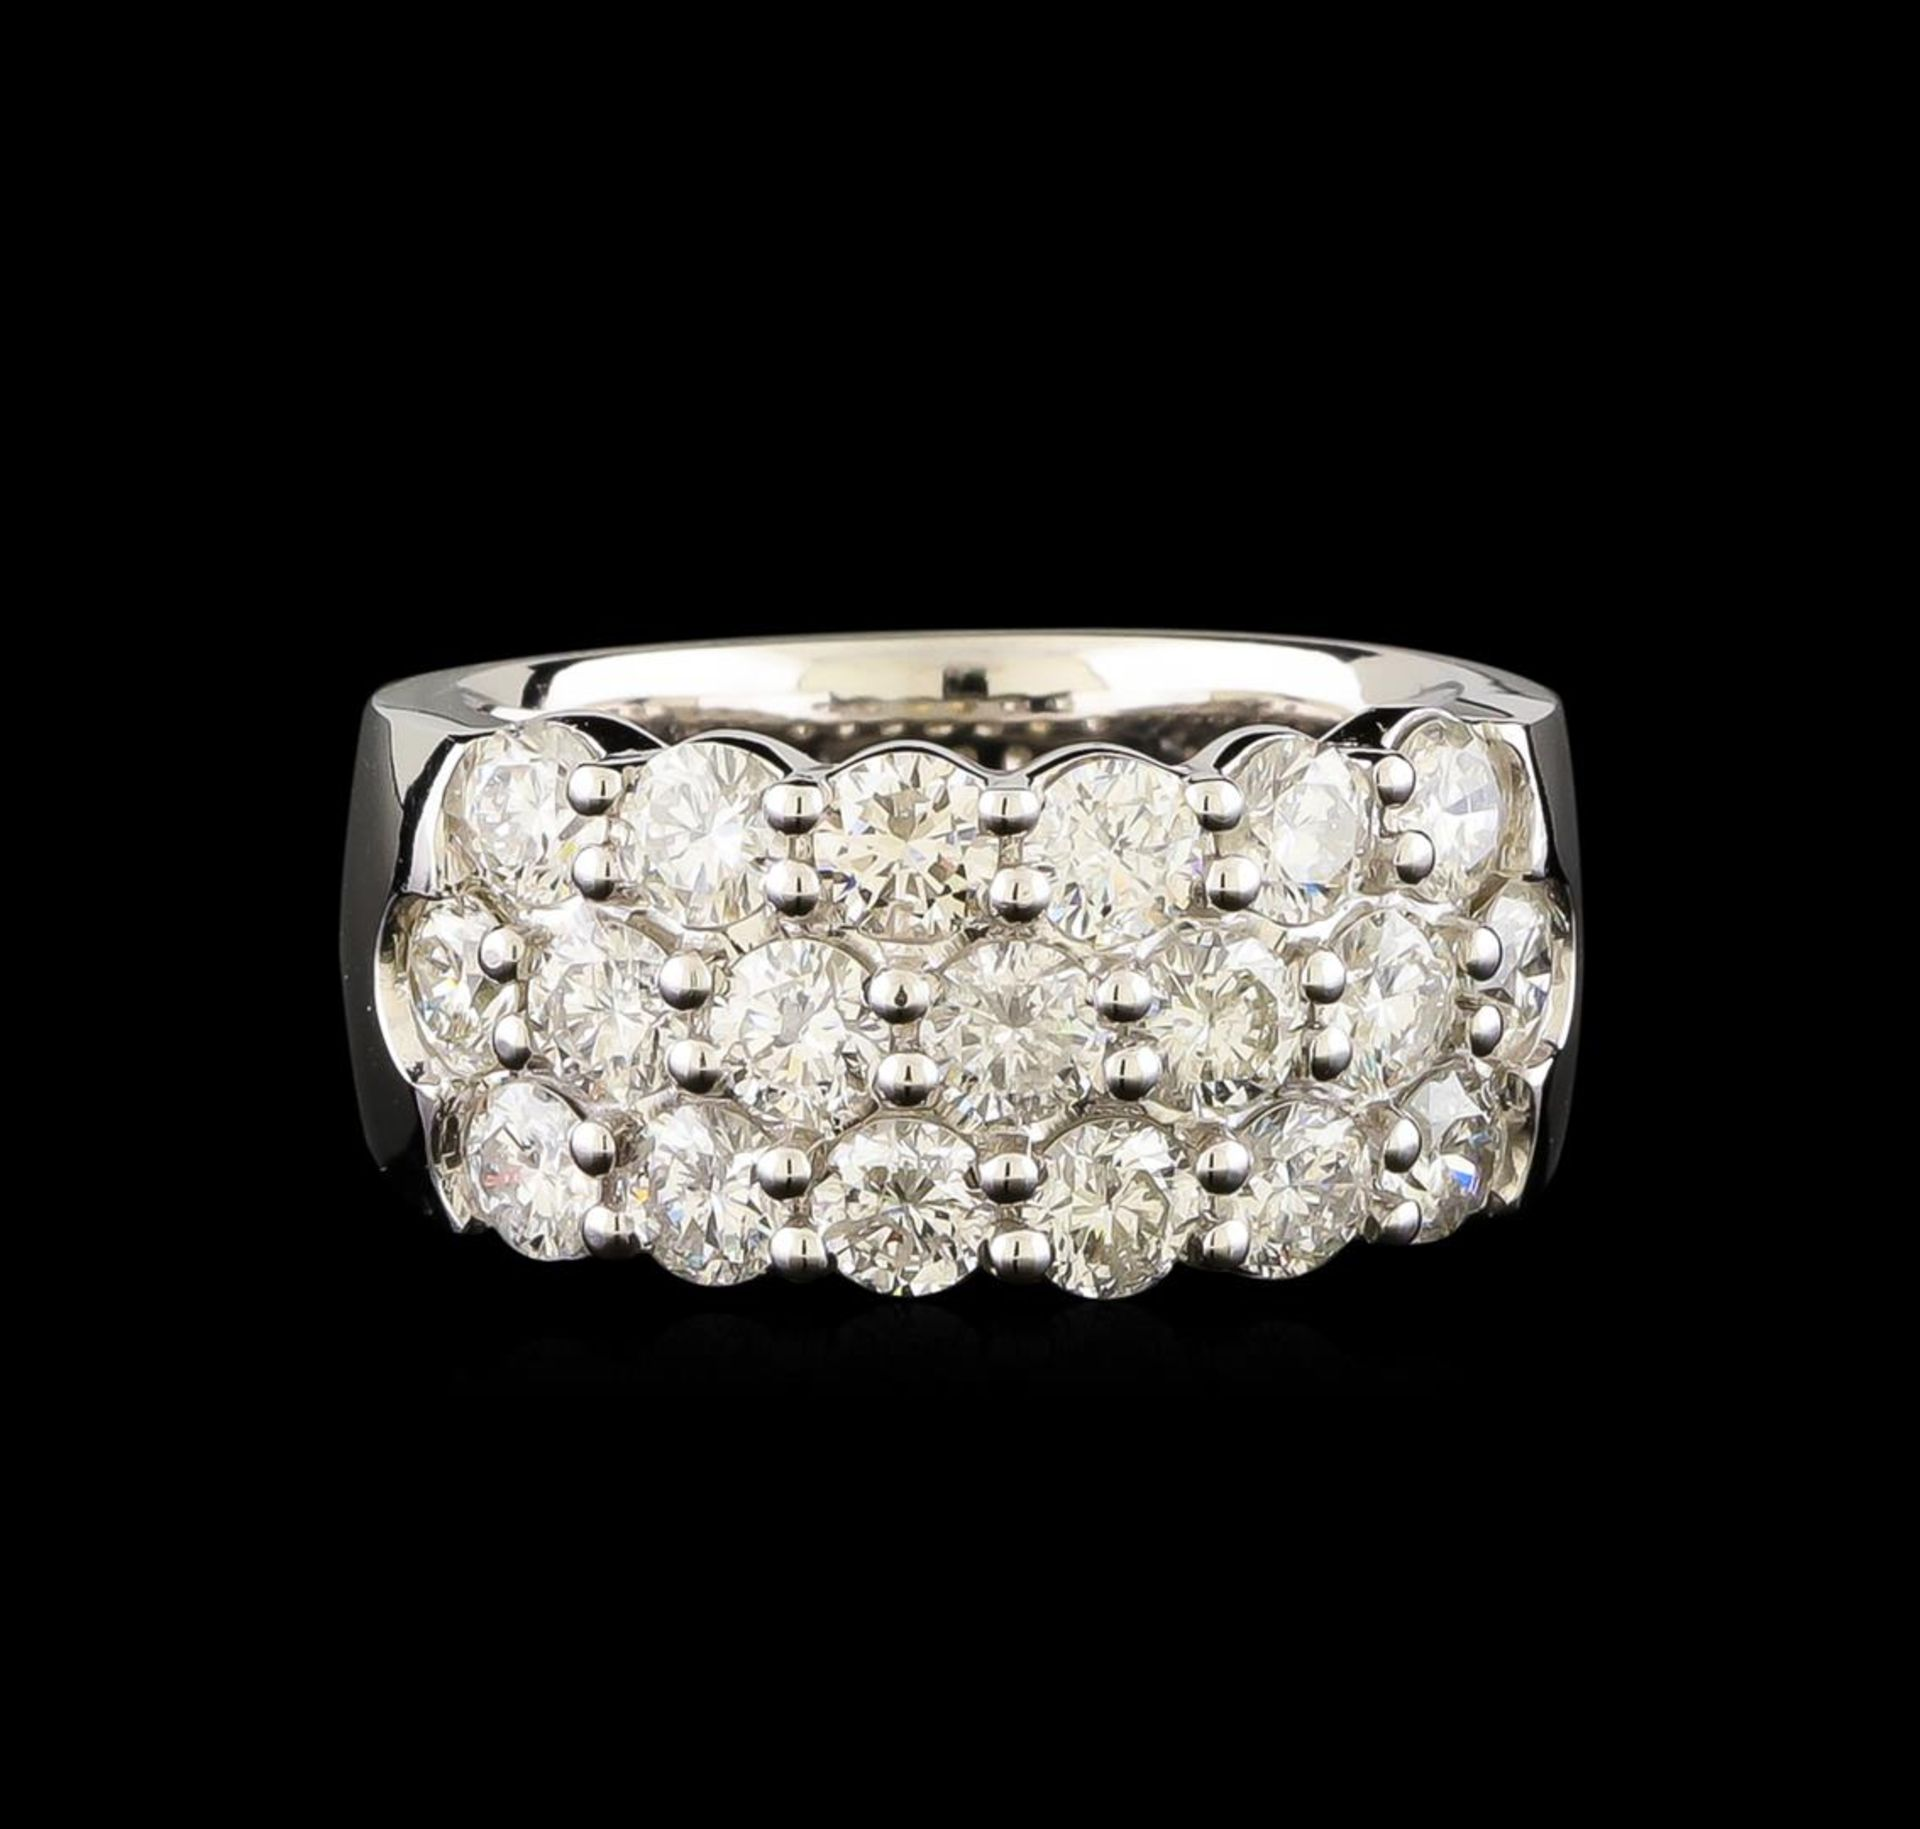 14KT White Gold 2.98 ctw Diamond Ring - Image 2 of 5